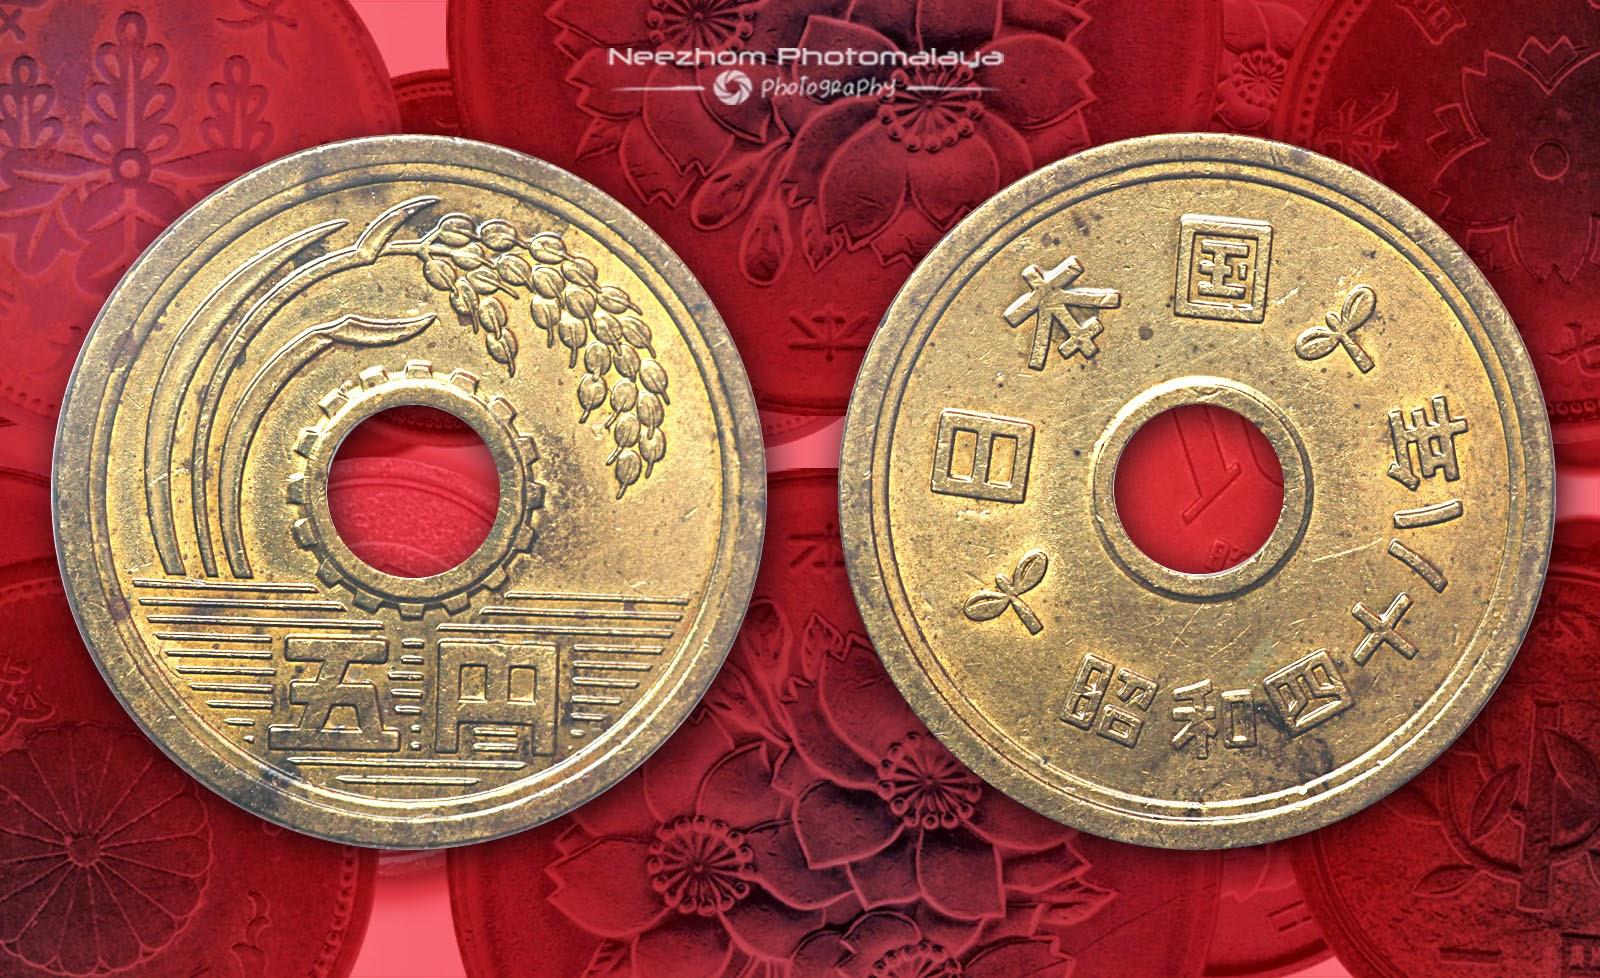 japanese coin 5 Yen